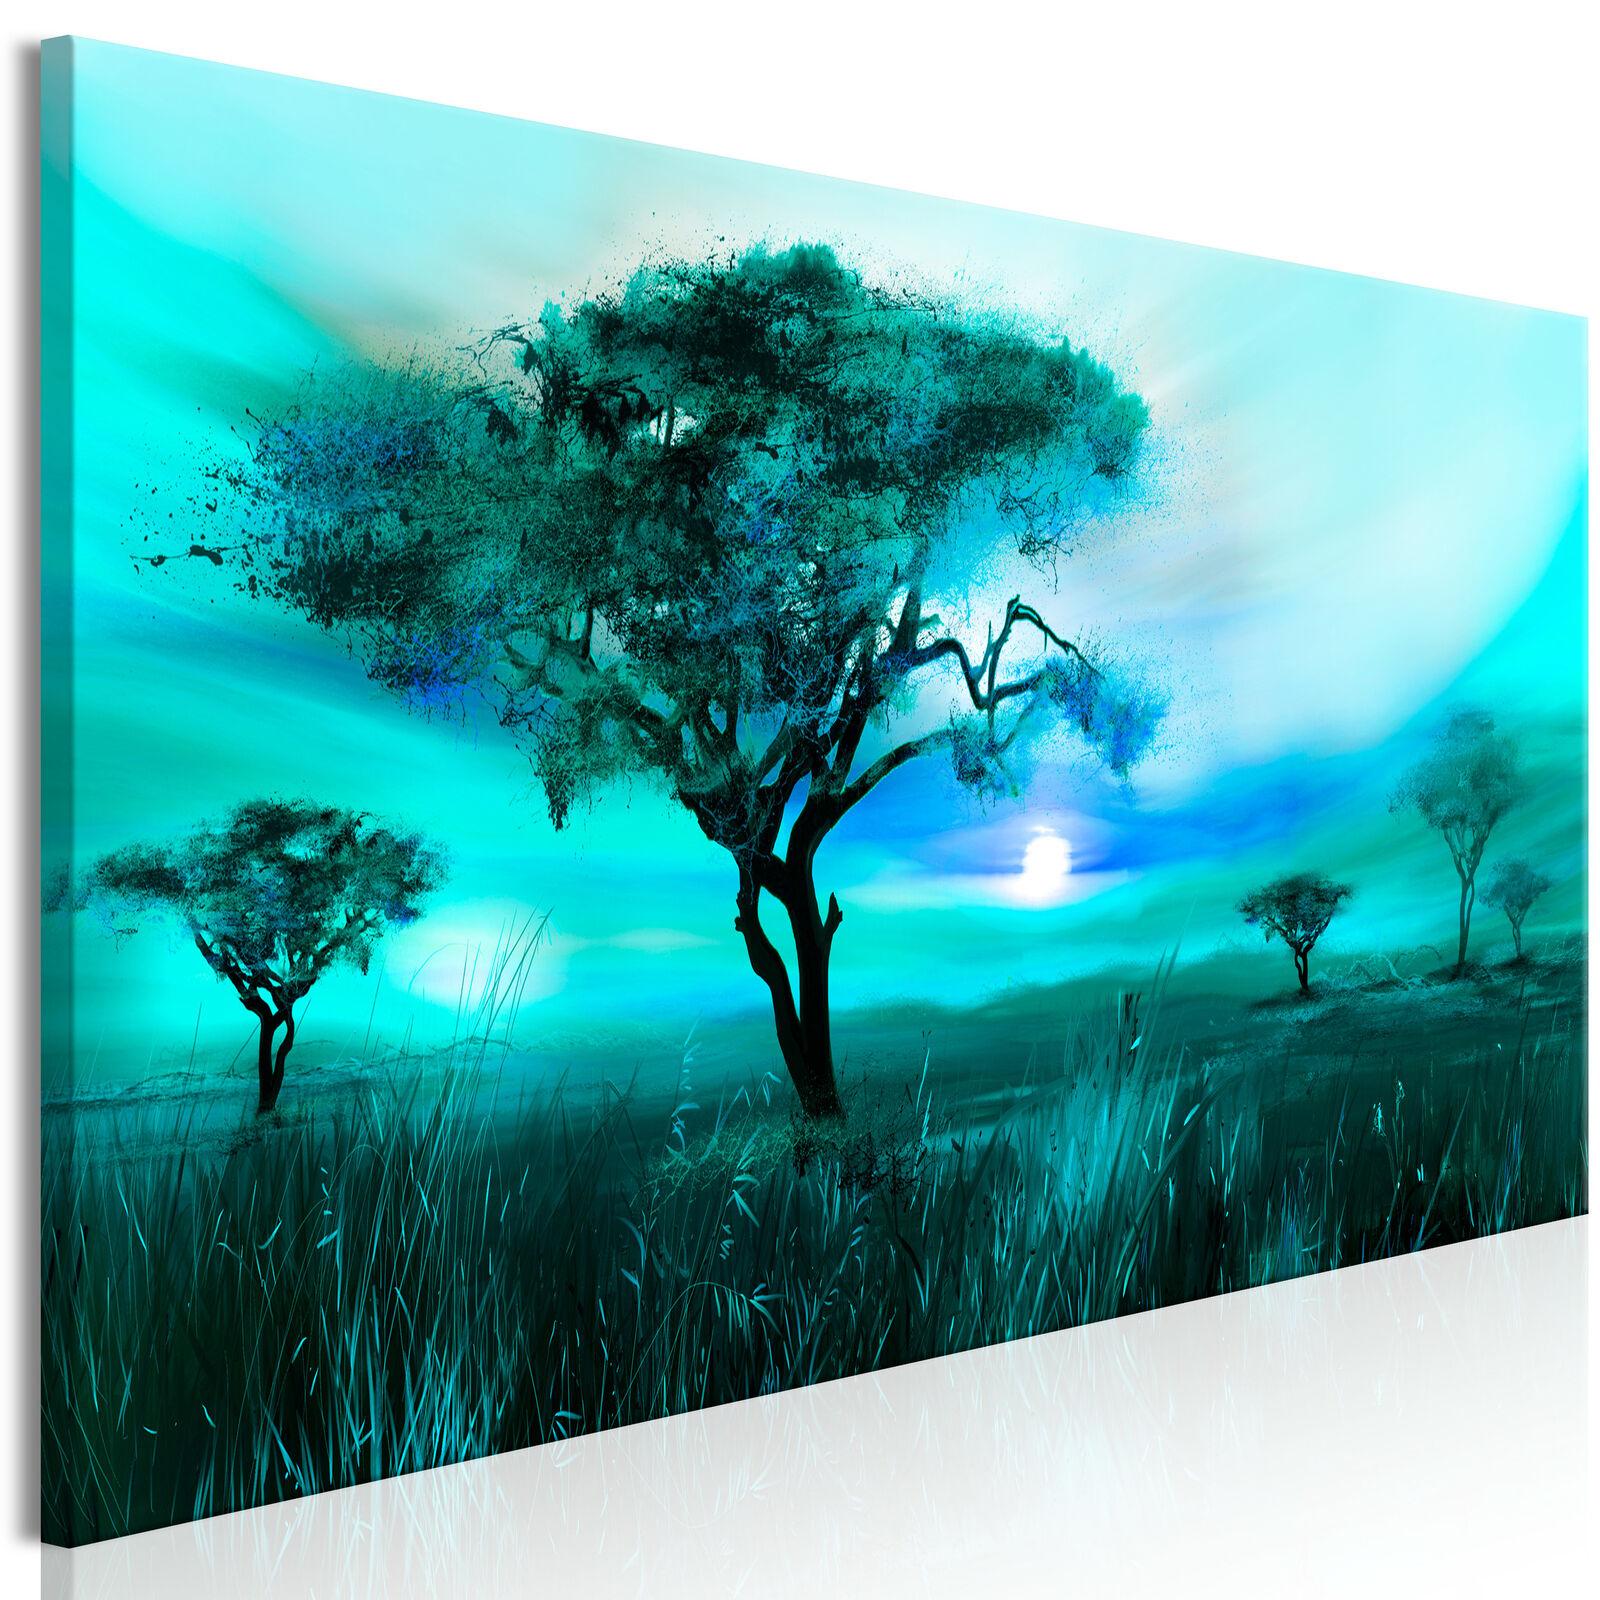 LEINWAND BILDER Wald Baum Abstrakt Akustikbild WANDBILDER Kunstdruck grün